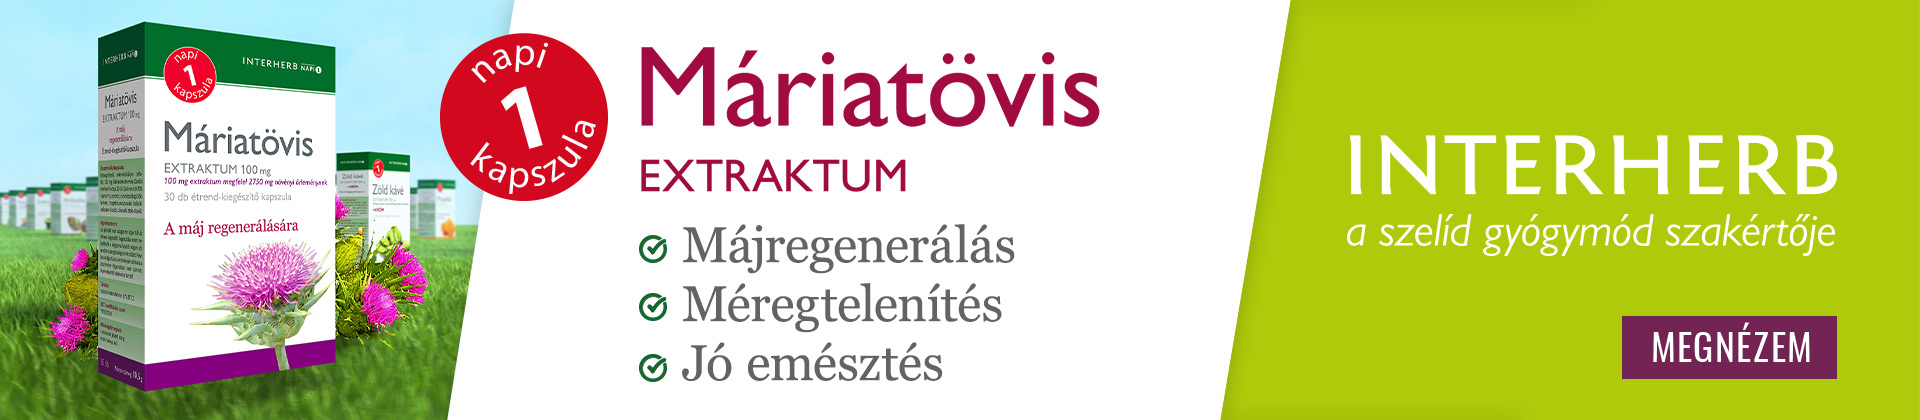 INTERHERB NAPI 1 MÁRIATÖVIS EXTRAKTUM KAPSZULA 30DB